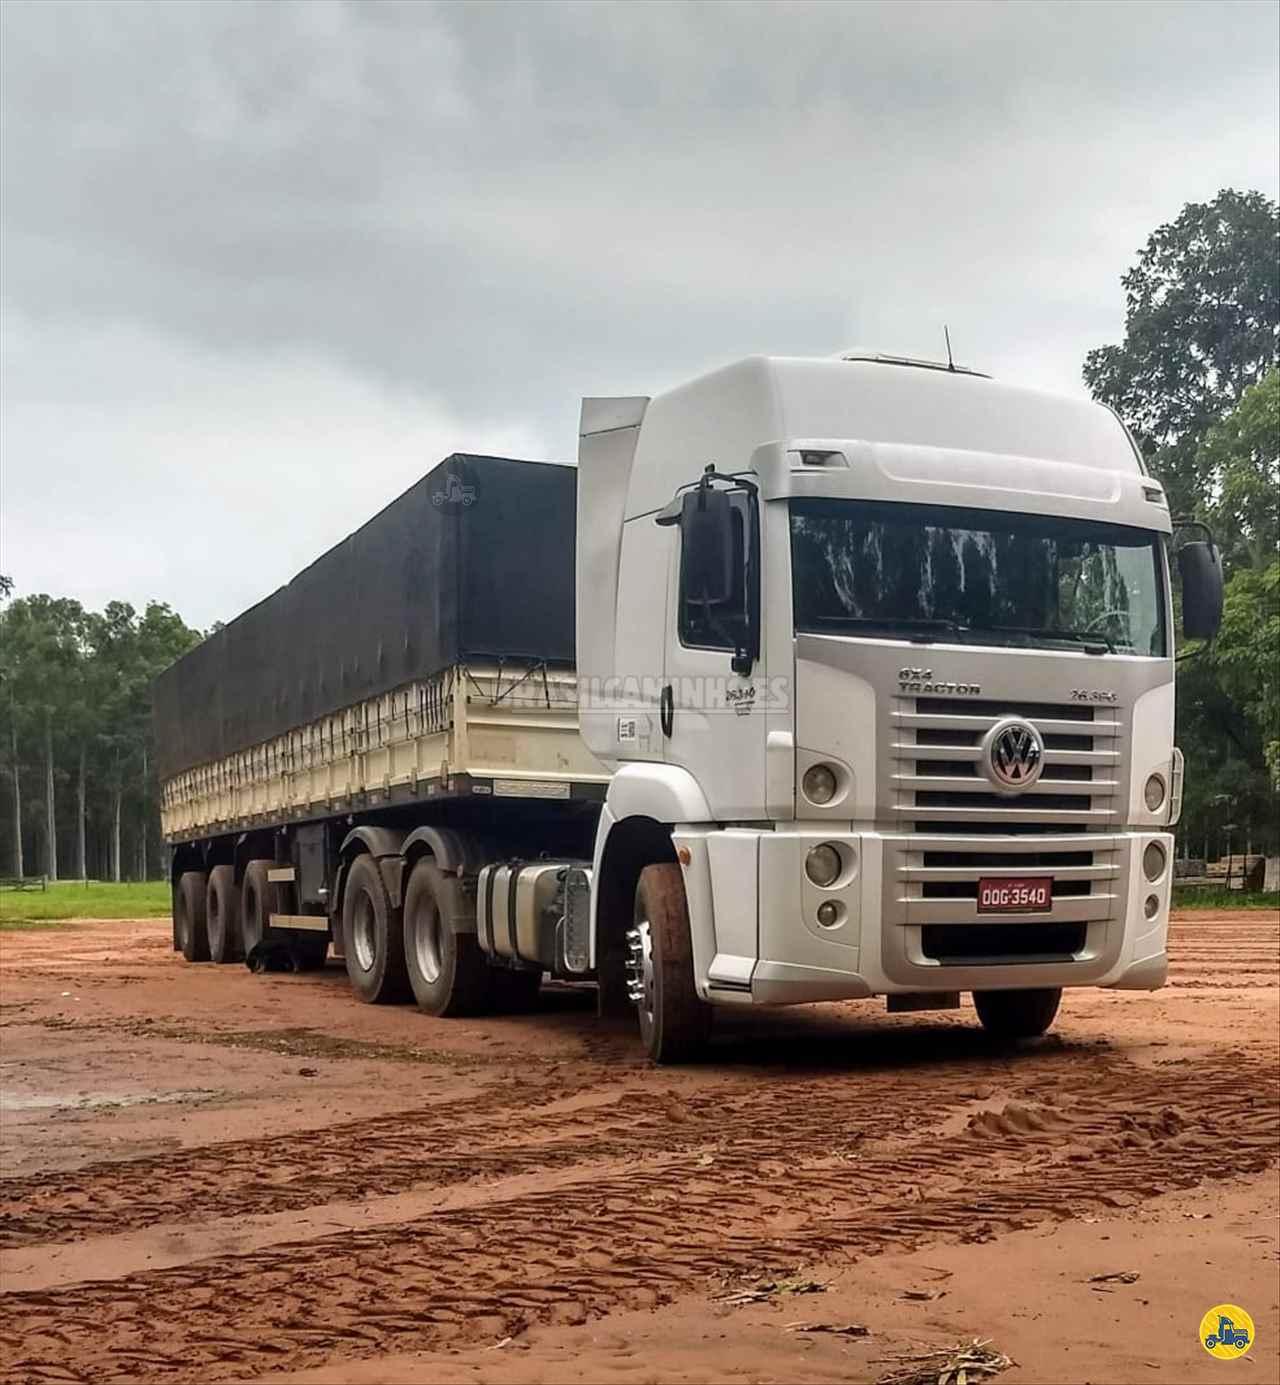 CAMINHAO VOLKSWAGEN VW 26390 Cavalo Mecânico Traçado 6x4 Brasil Caminhões Sinop SINOP MATO GROSSO MT